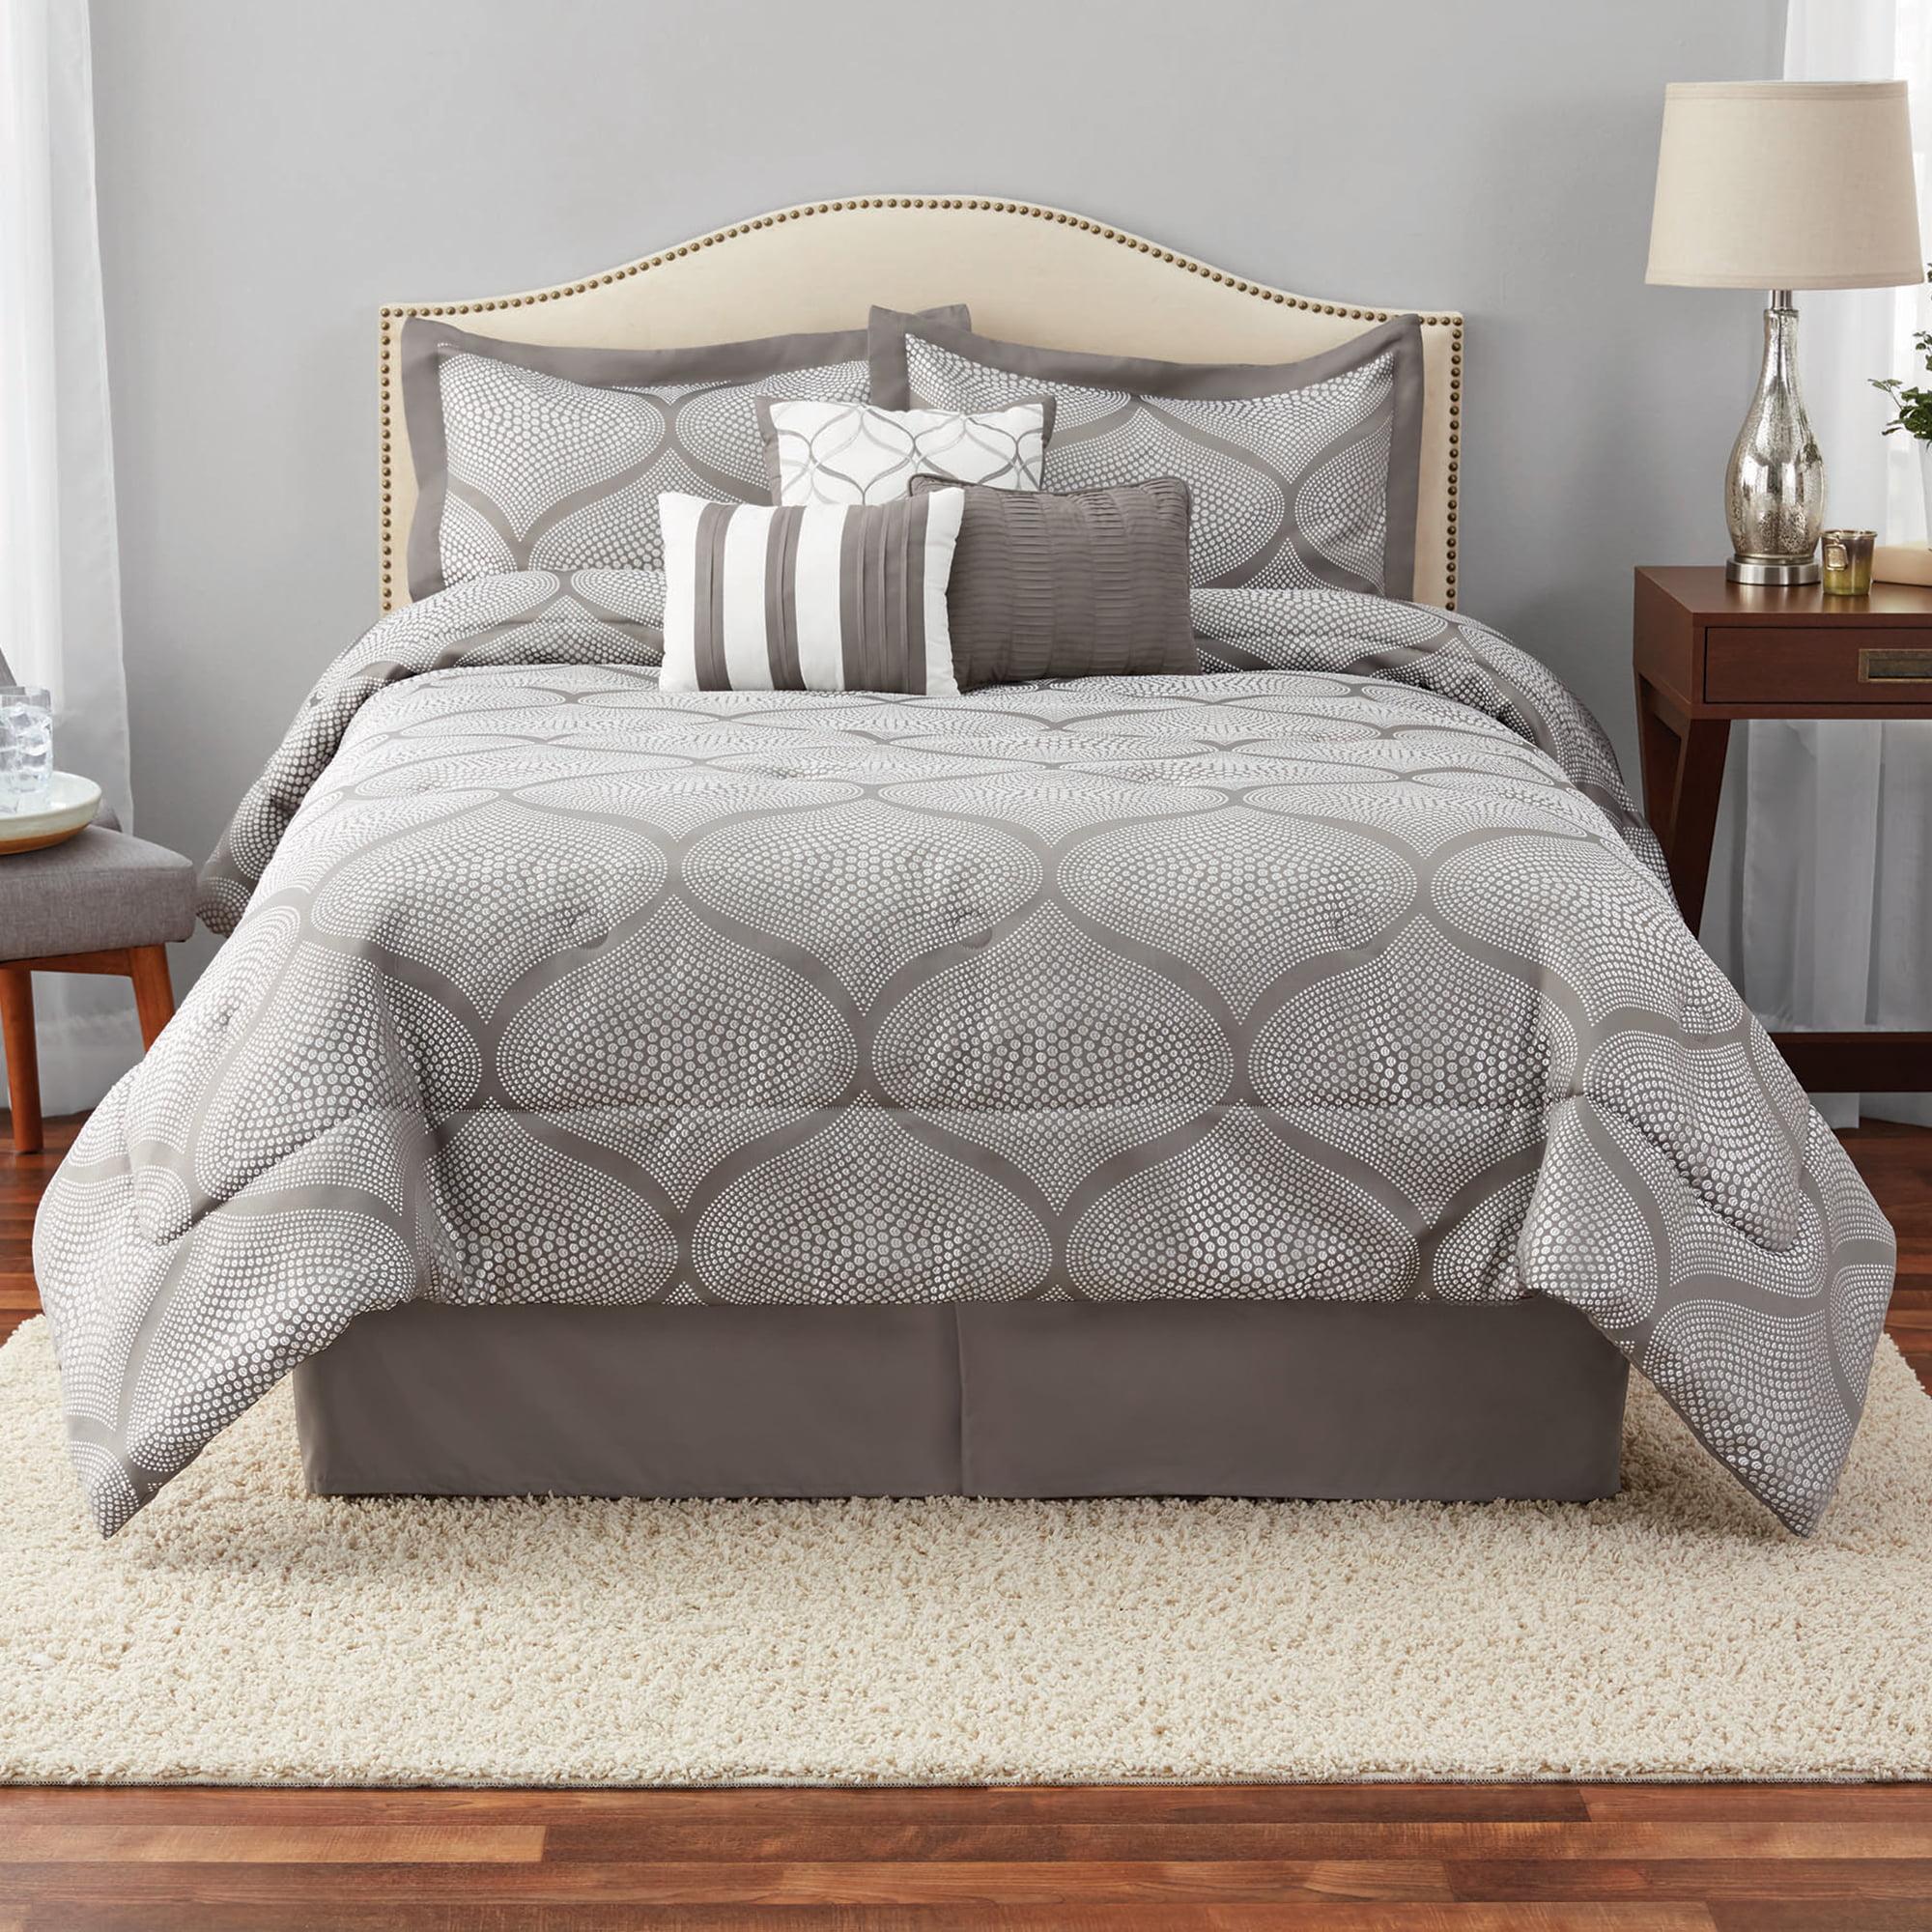 Mainstays Full or Queen Damask Comforter Set, 7 Piece